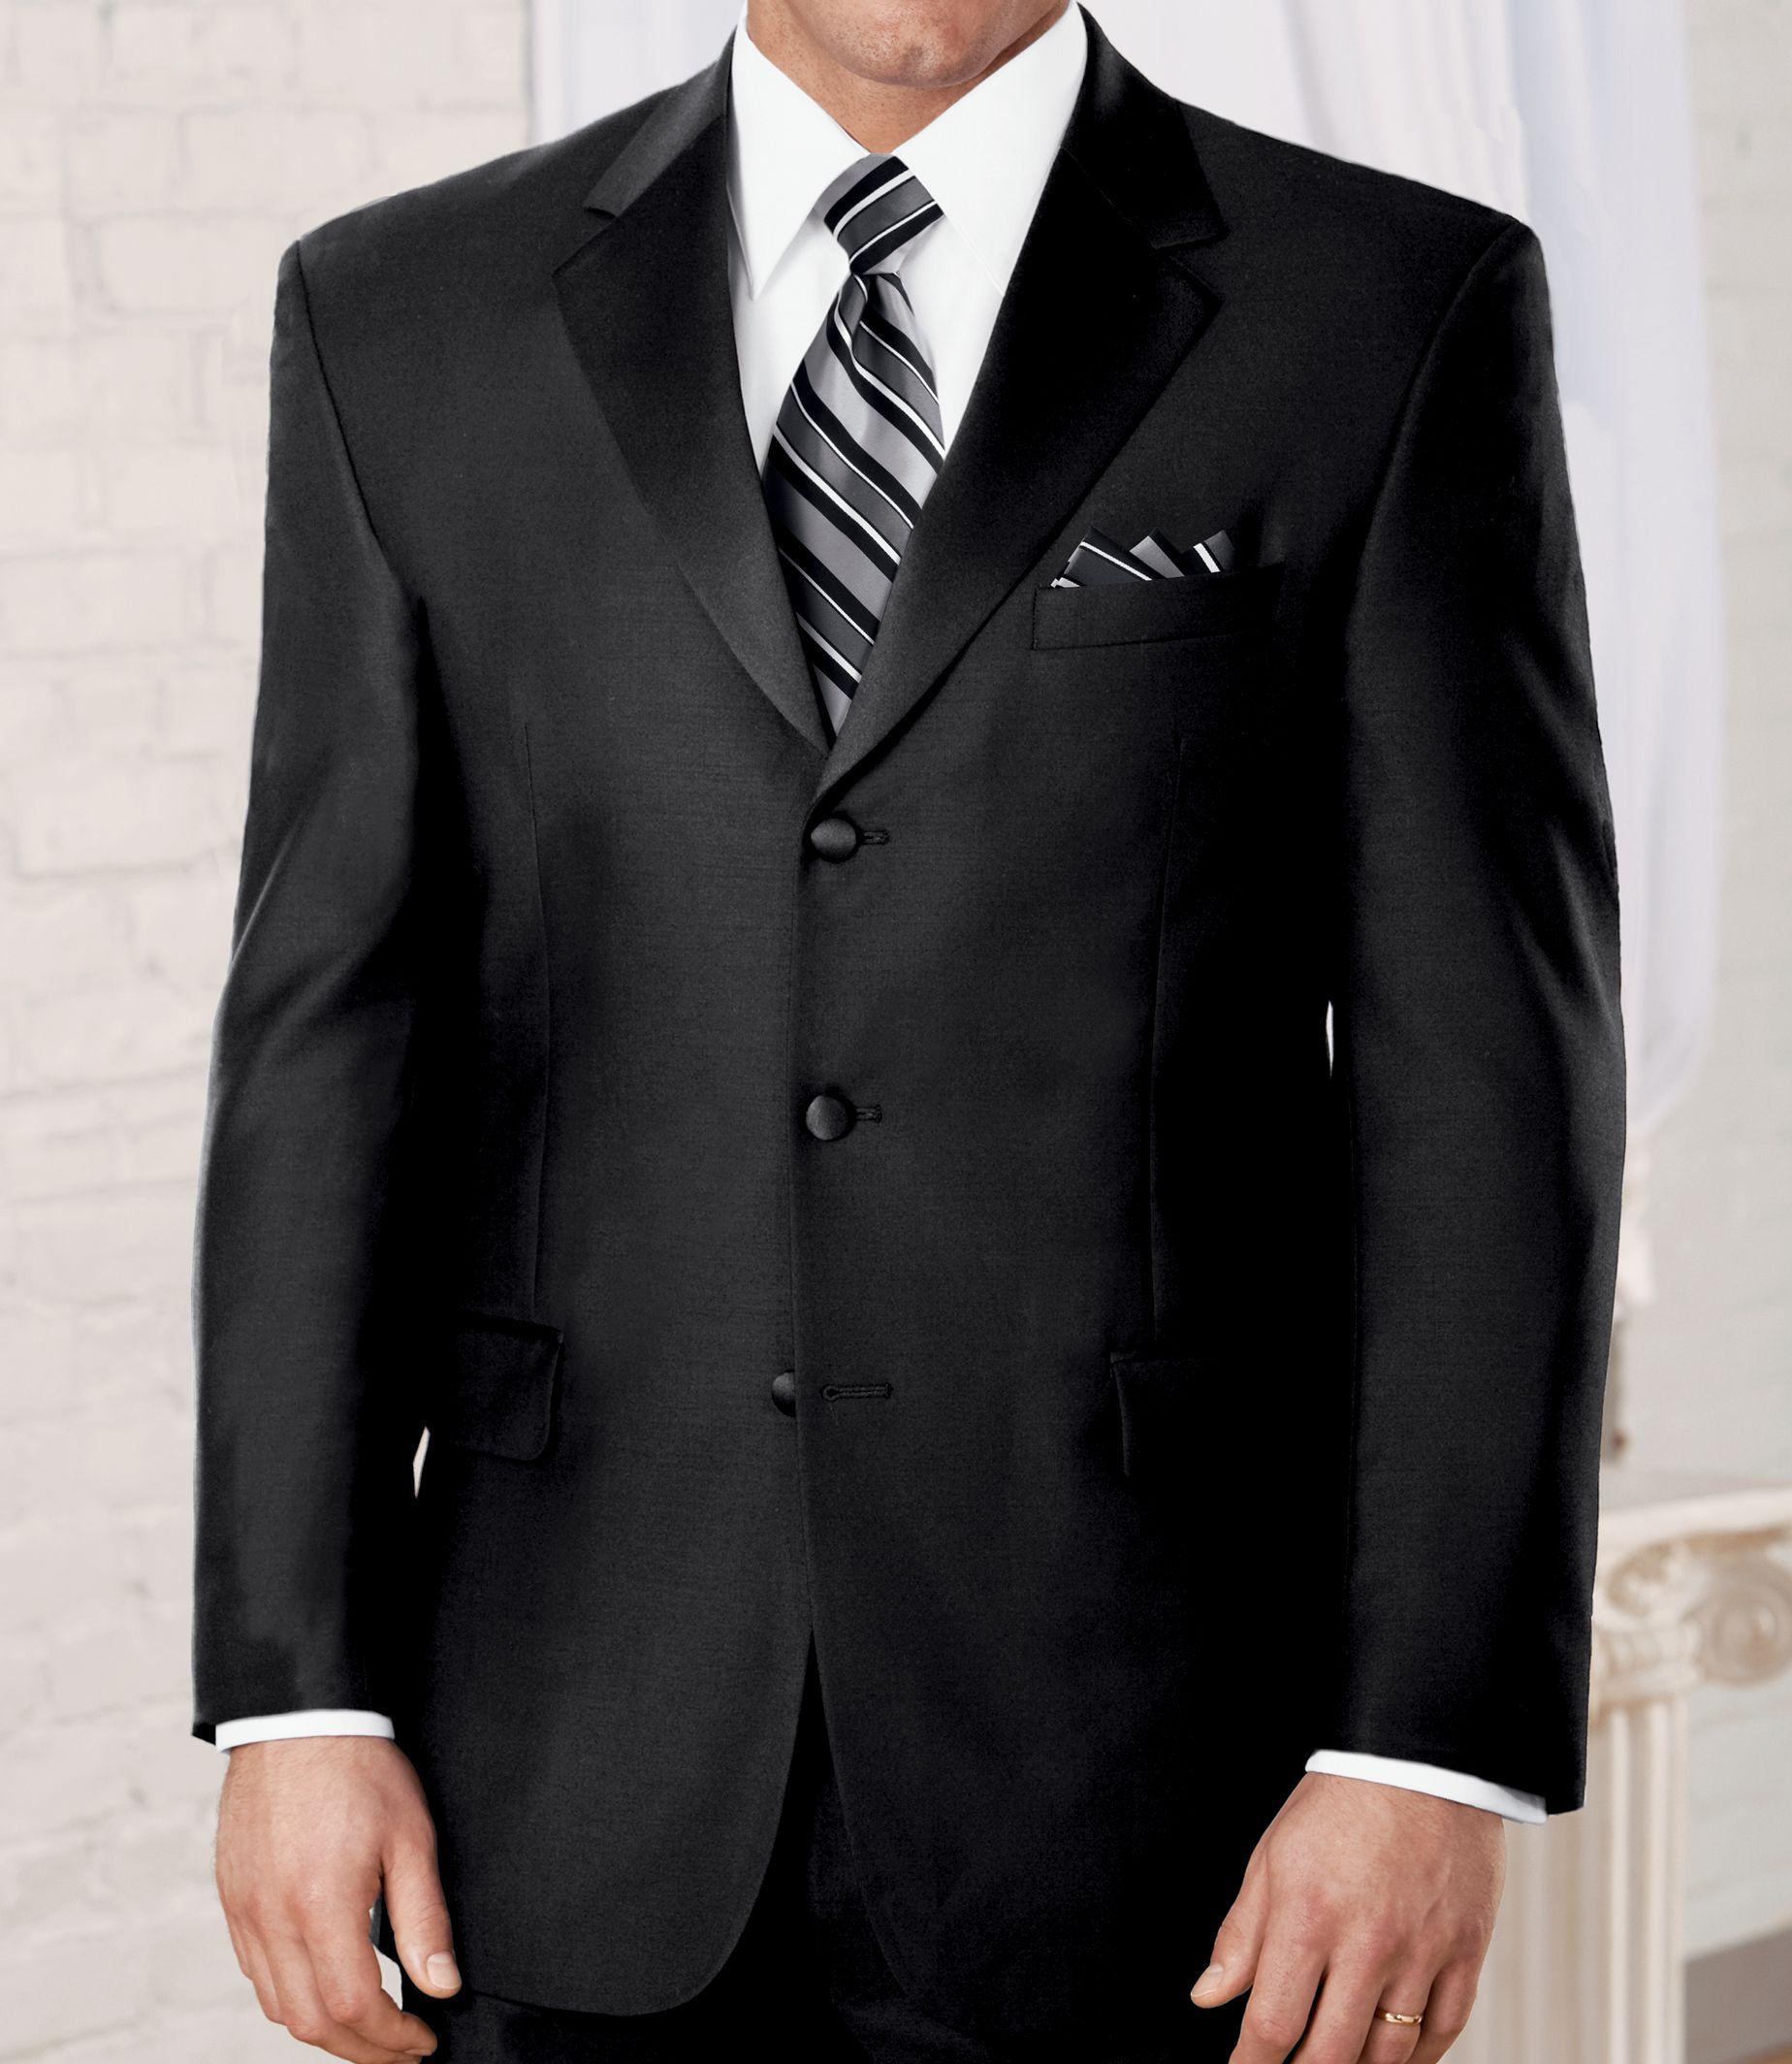 1920s Men's Formal Wear- Tuxedo, Vest, Shoes, Top Hats